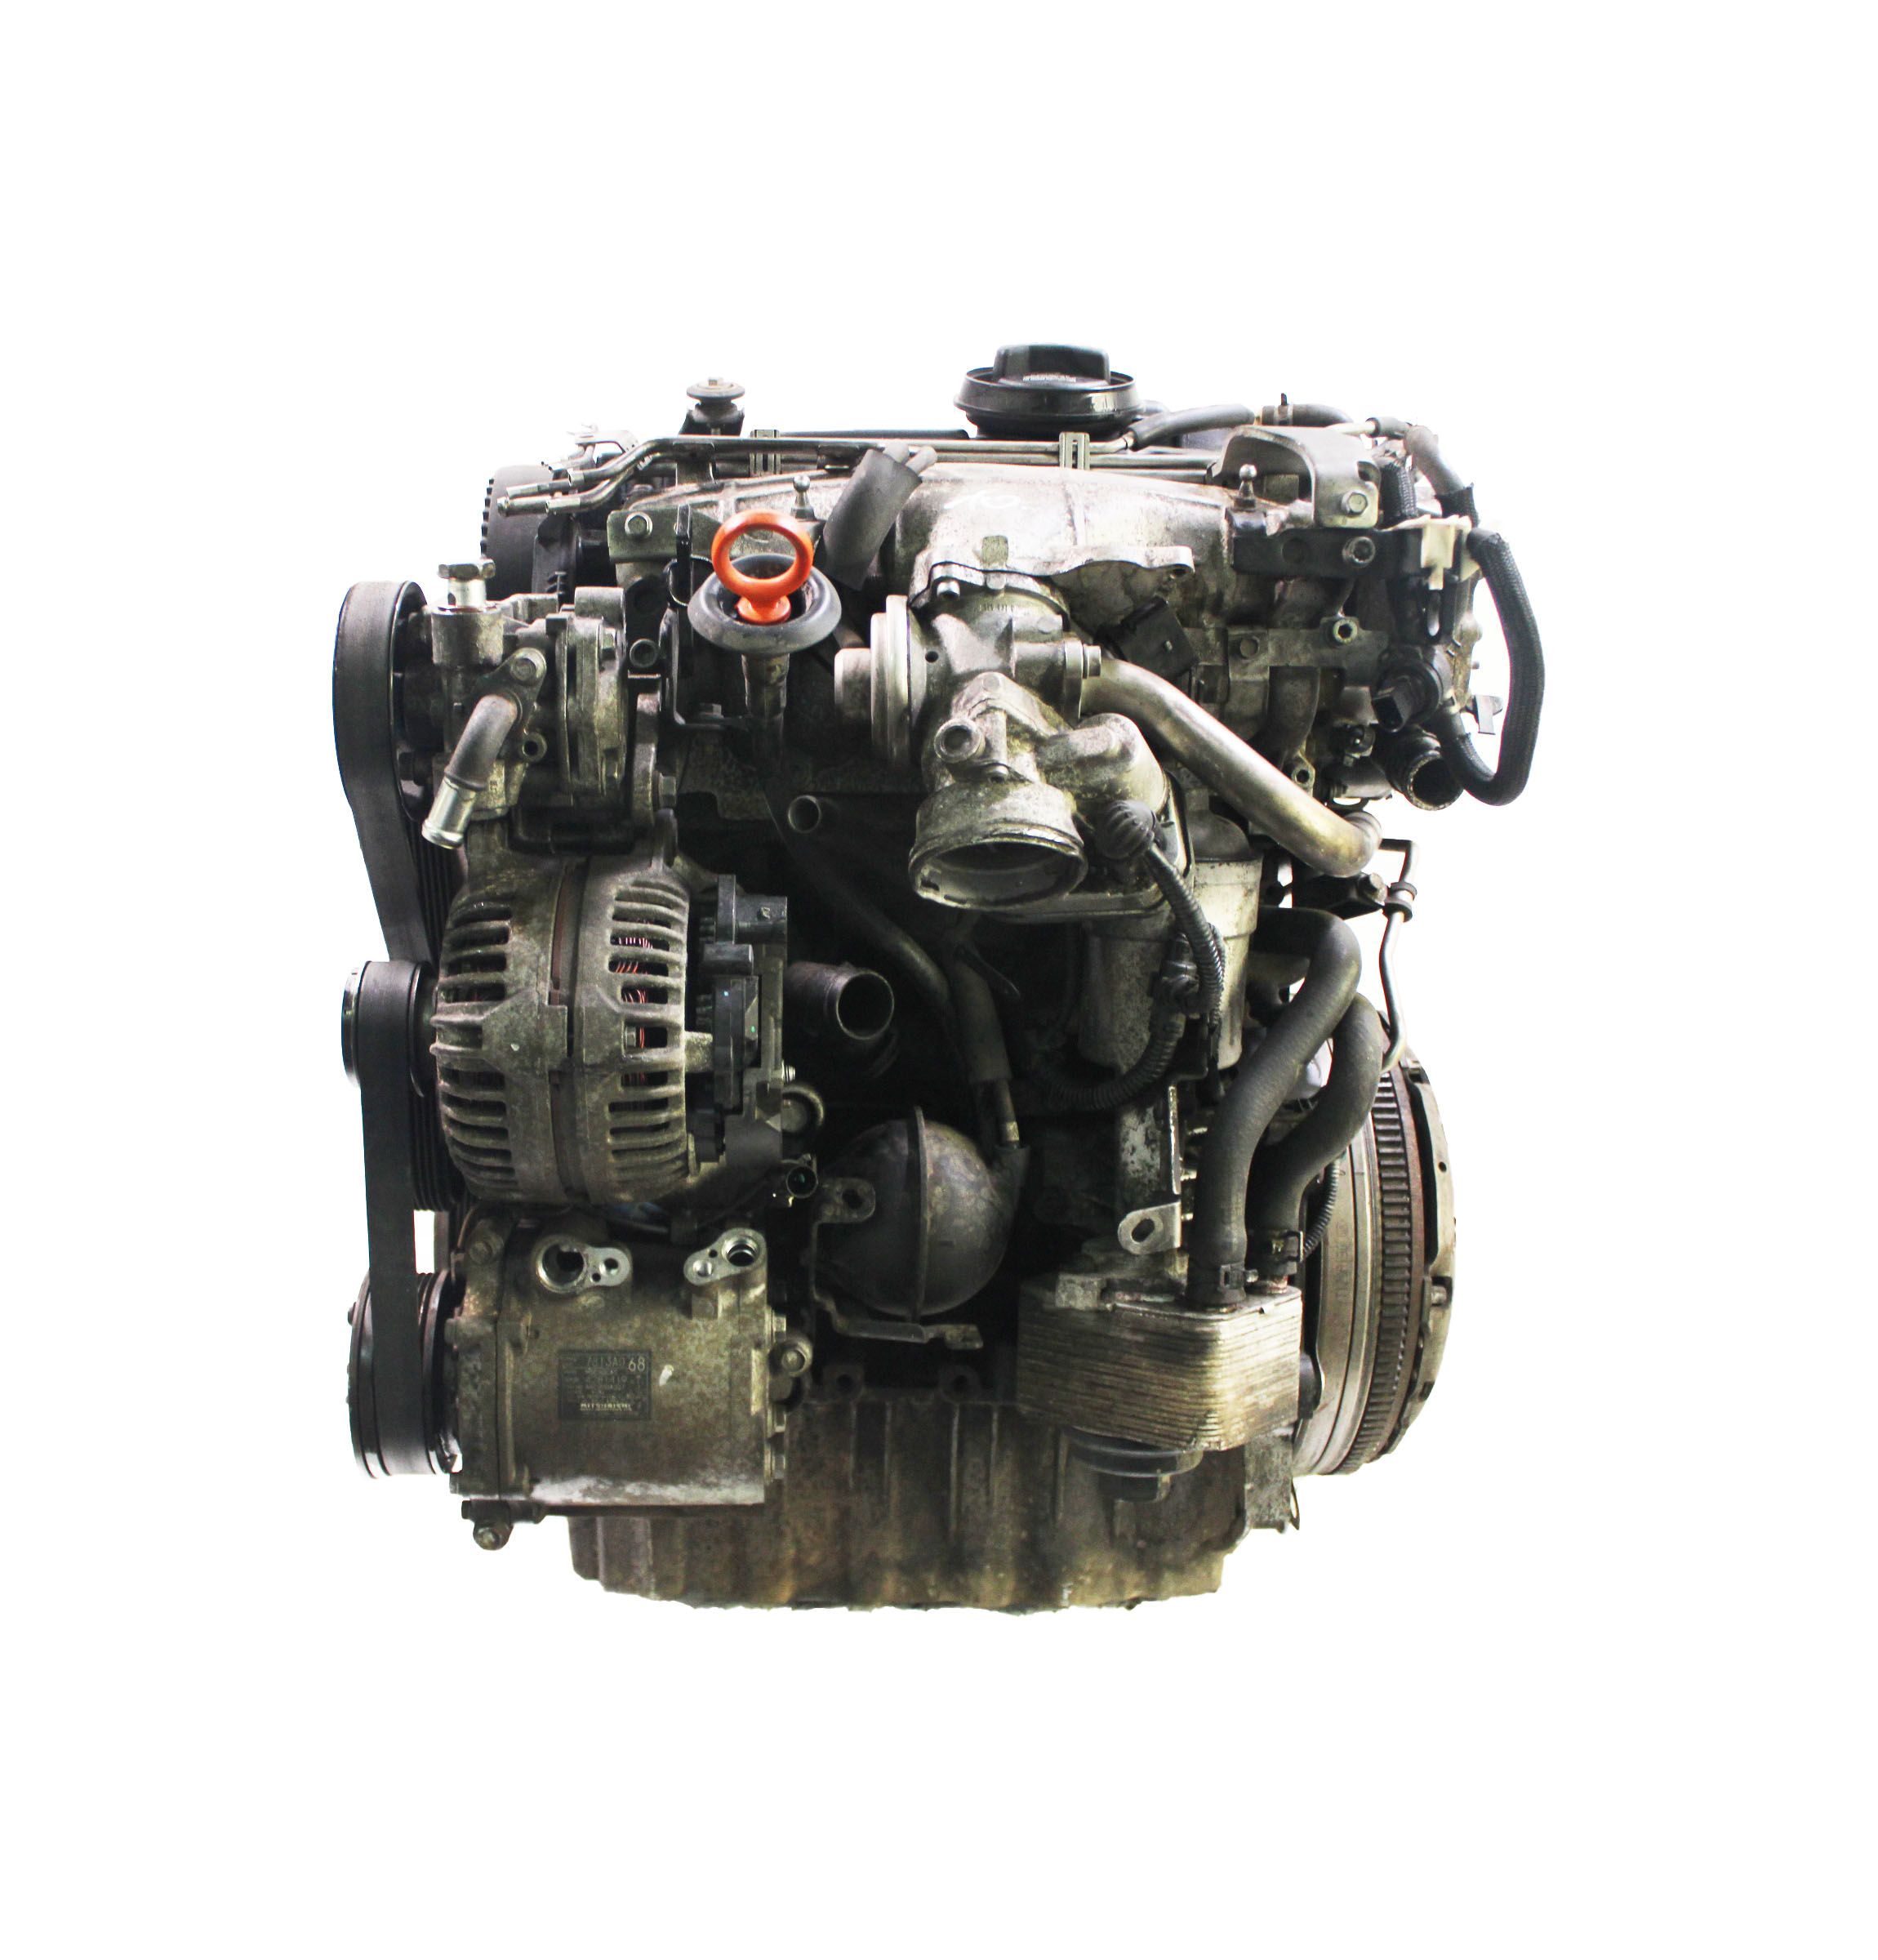 Motor für Mitsubishi Outlander MK2 II 2,0 DI-D Diesel BSY 140 PS 103 KW